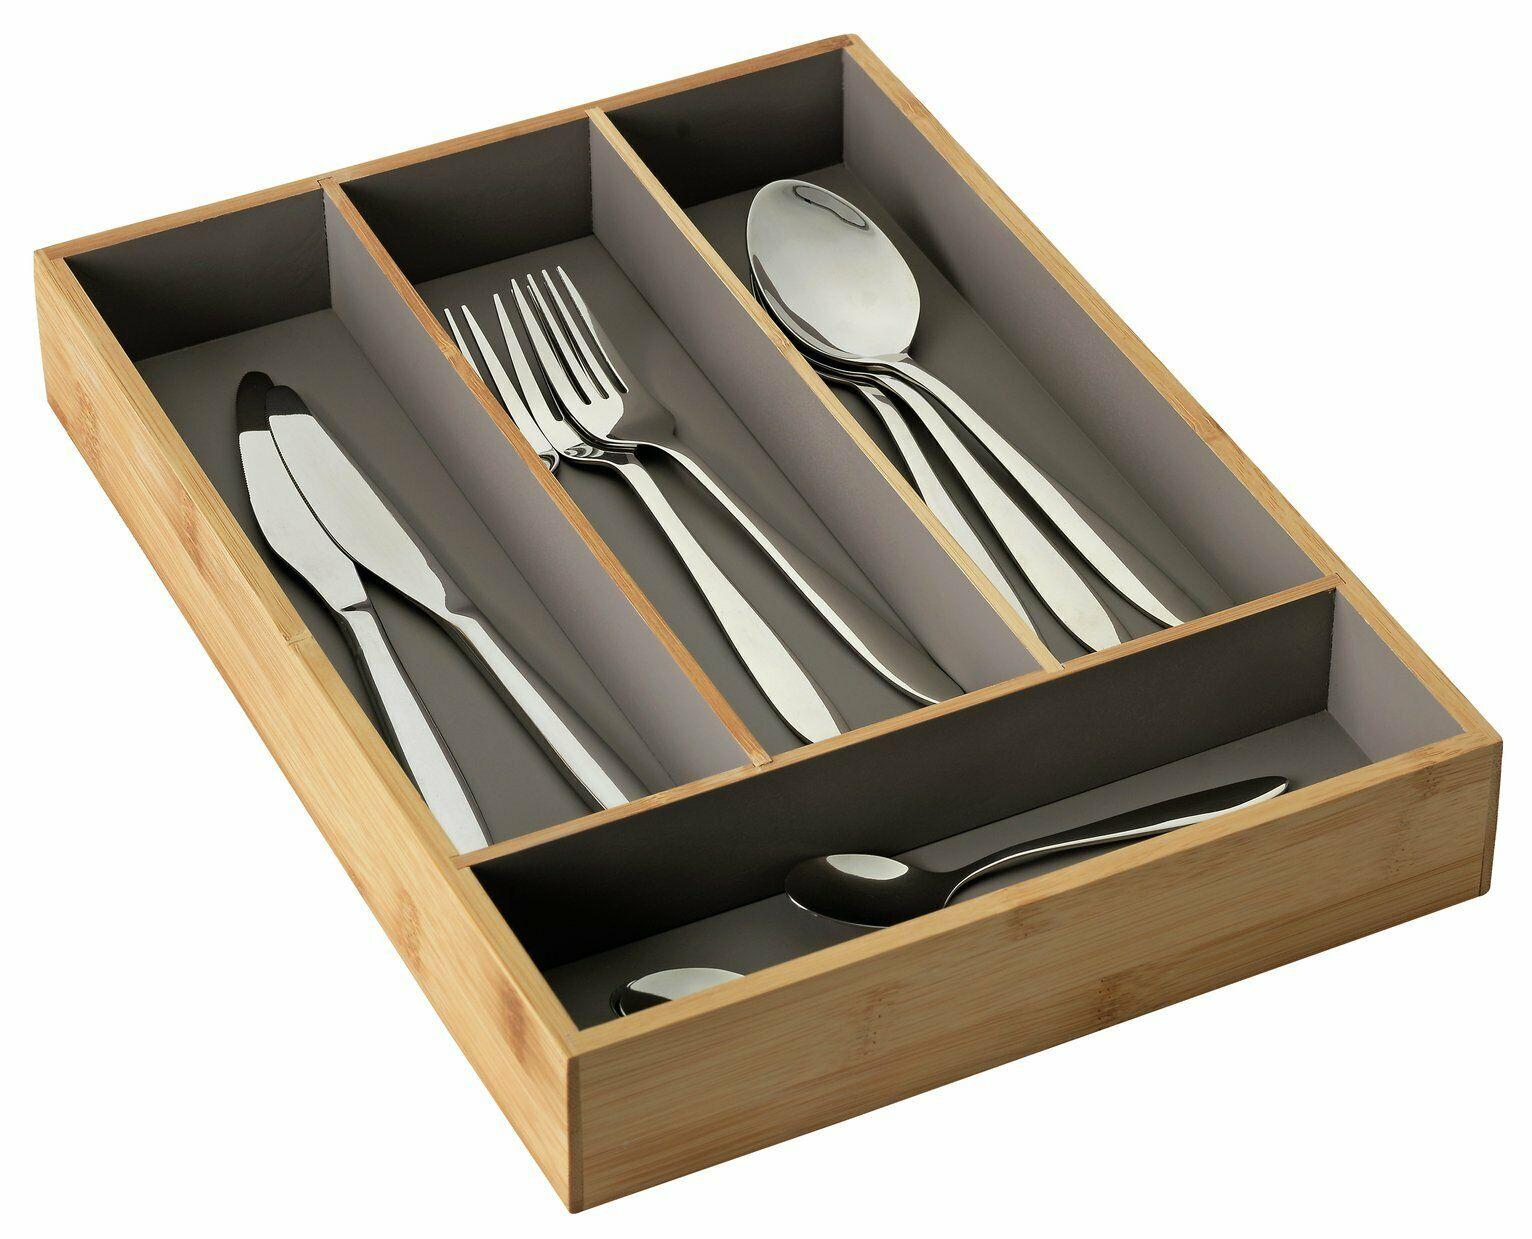 Argos Home Cutlery Tray - Bamboo and Grey - £3.50 @ Argos / ebay